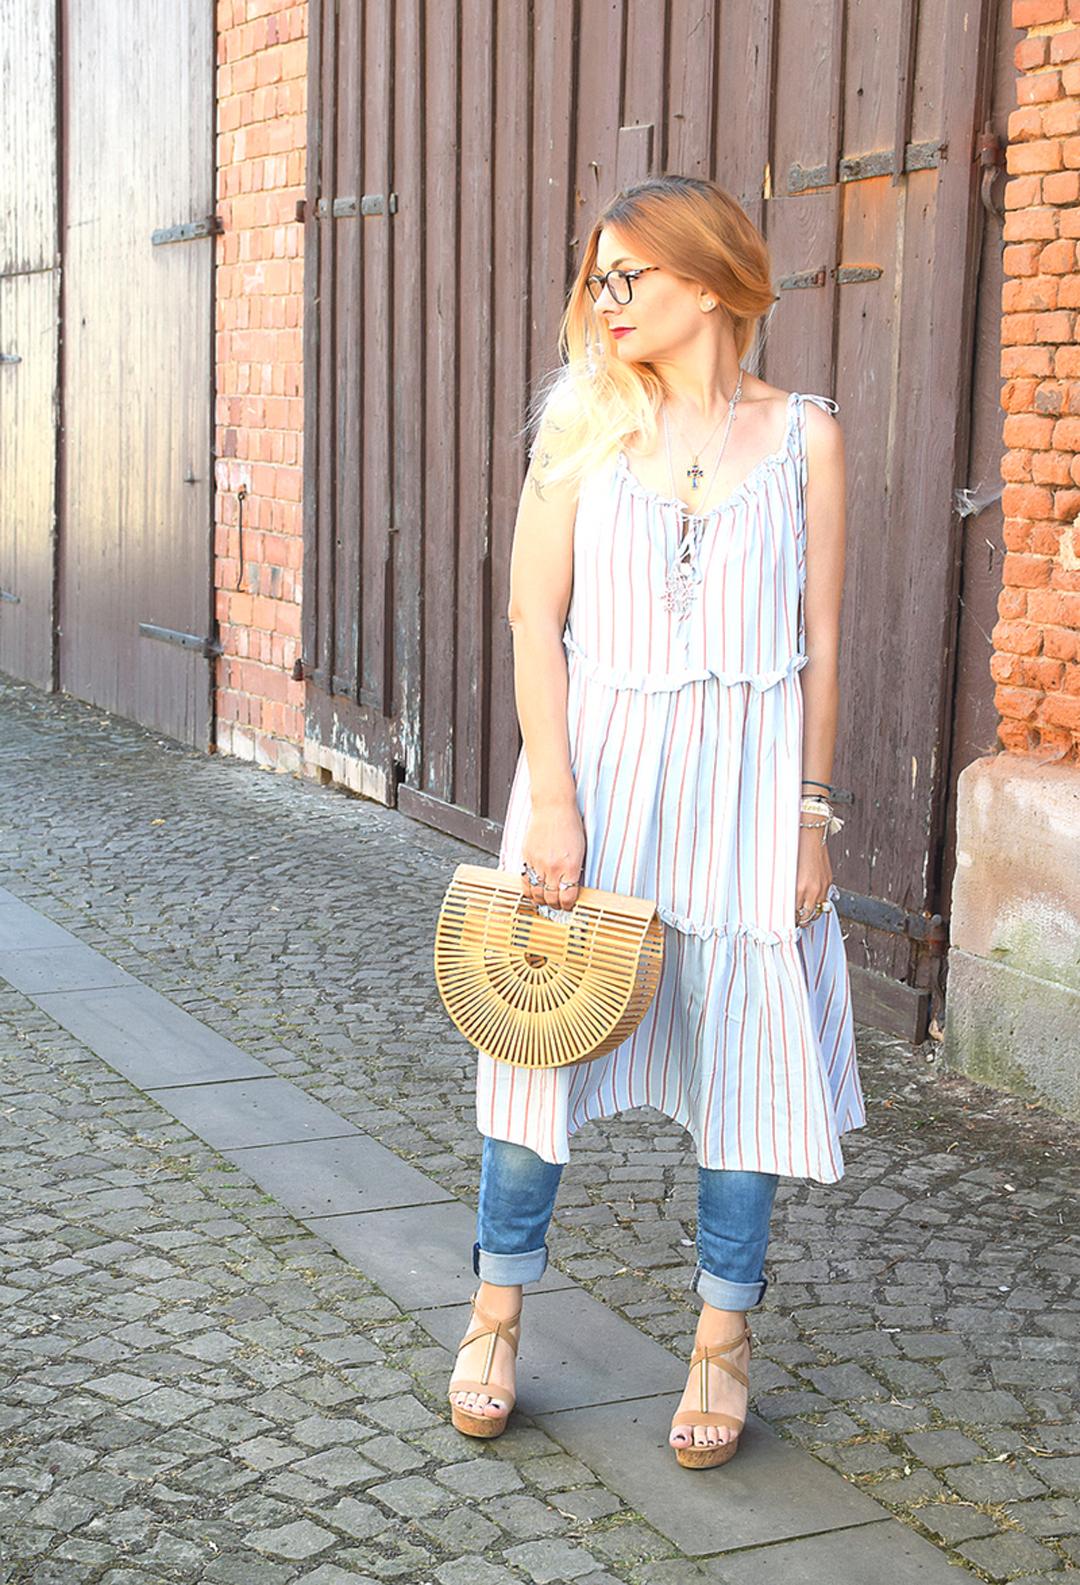 Sommerkleid über Hose tragen, Modeblog